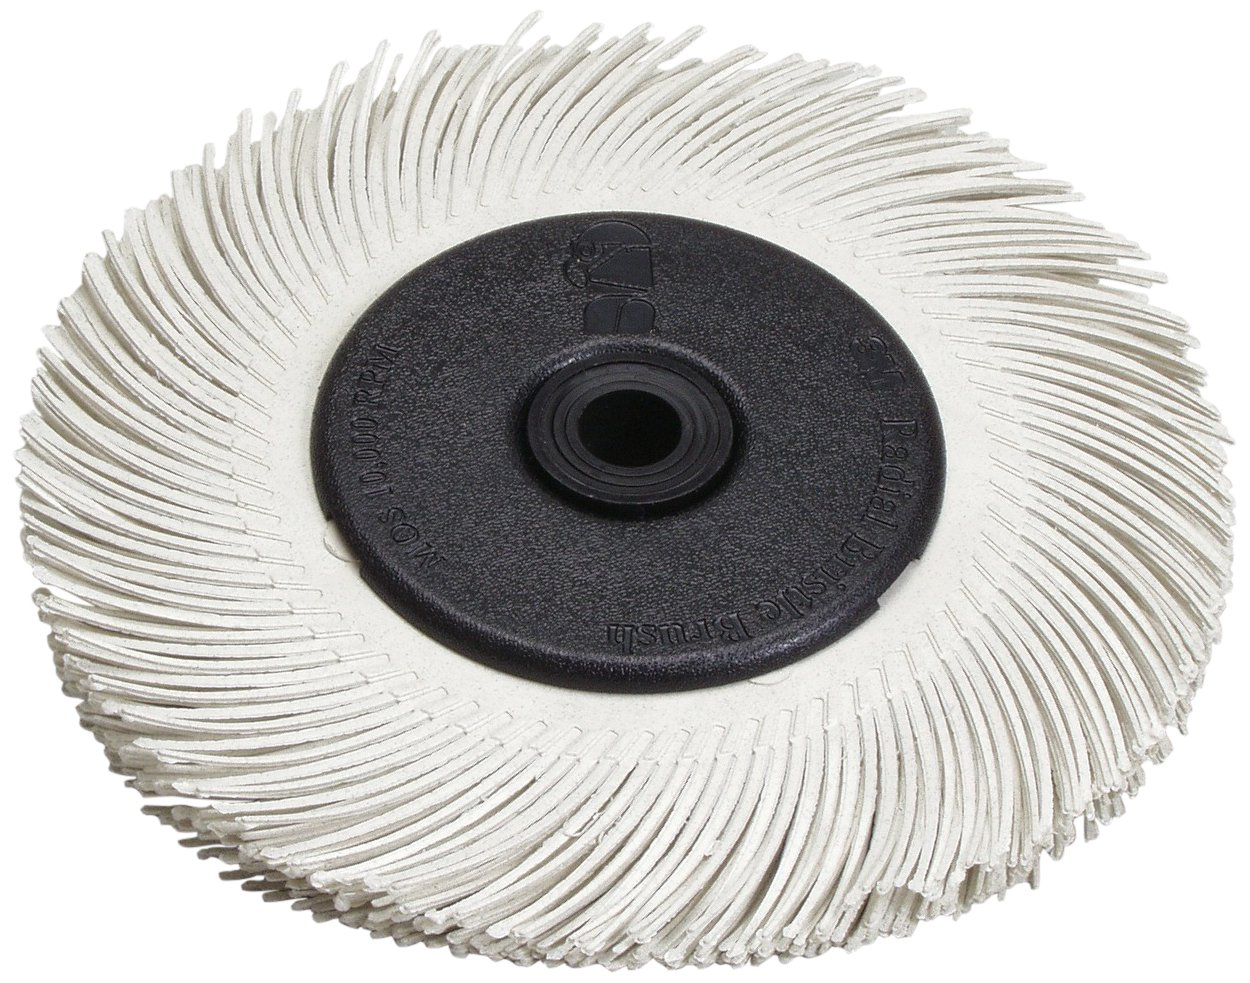 Scotch-Brite(TM) Radial Bristle Brush Replacement Disc T-C 120 Refill, Aluminum Oxide, 6000 rpm, 6 Diameter x 1 Width, White (Pack of 40)